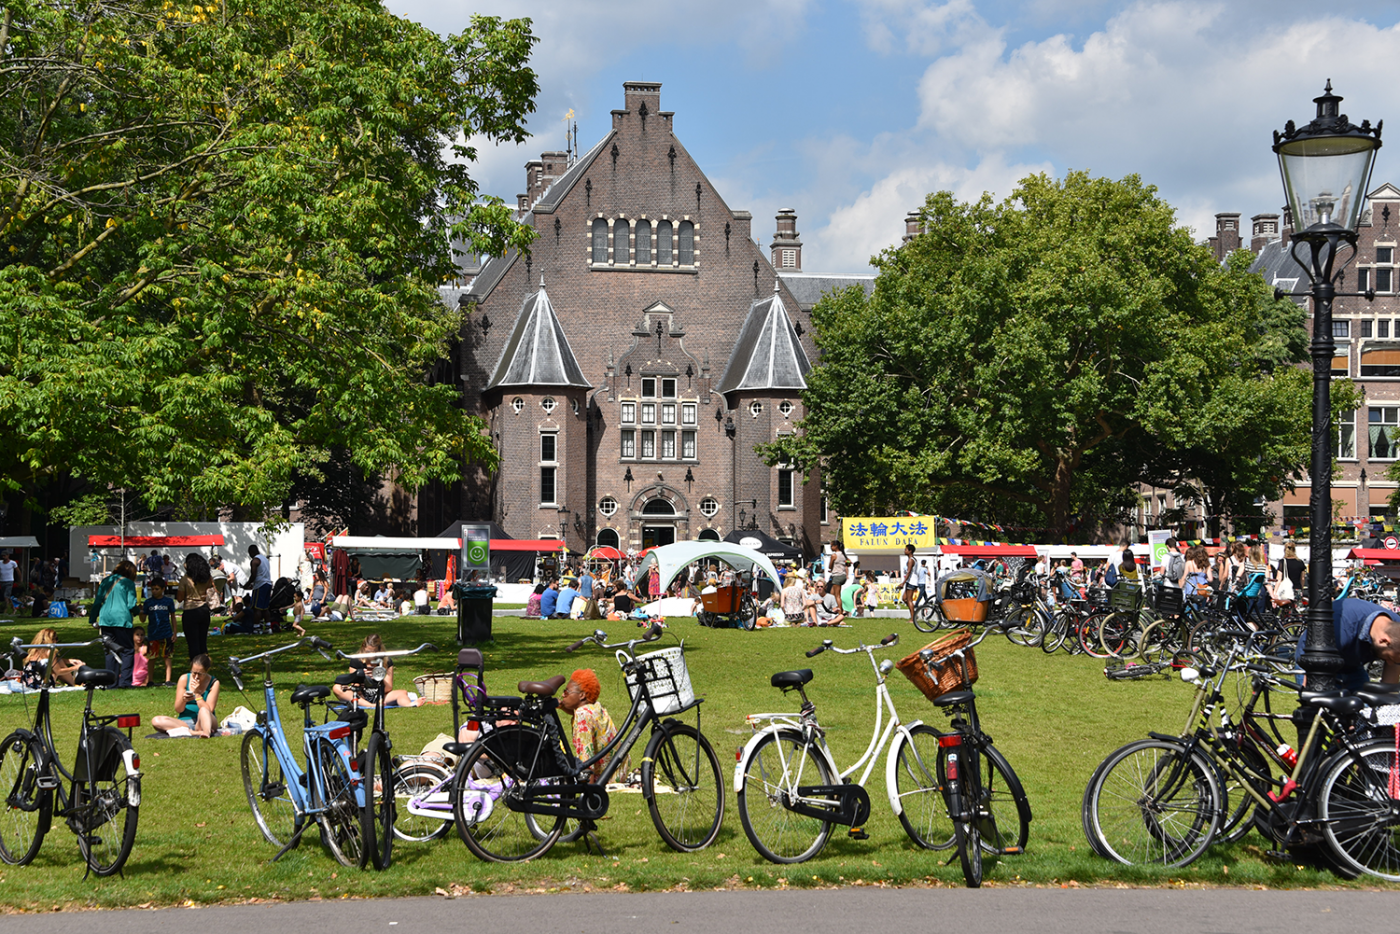 oosterpark-amsterdam-burosantenco-park-renovatie-landschapsarchitectuur-klimaatadaptief-biodiversiteit-stadspark-grootveld-pierenbadje